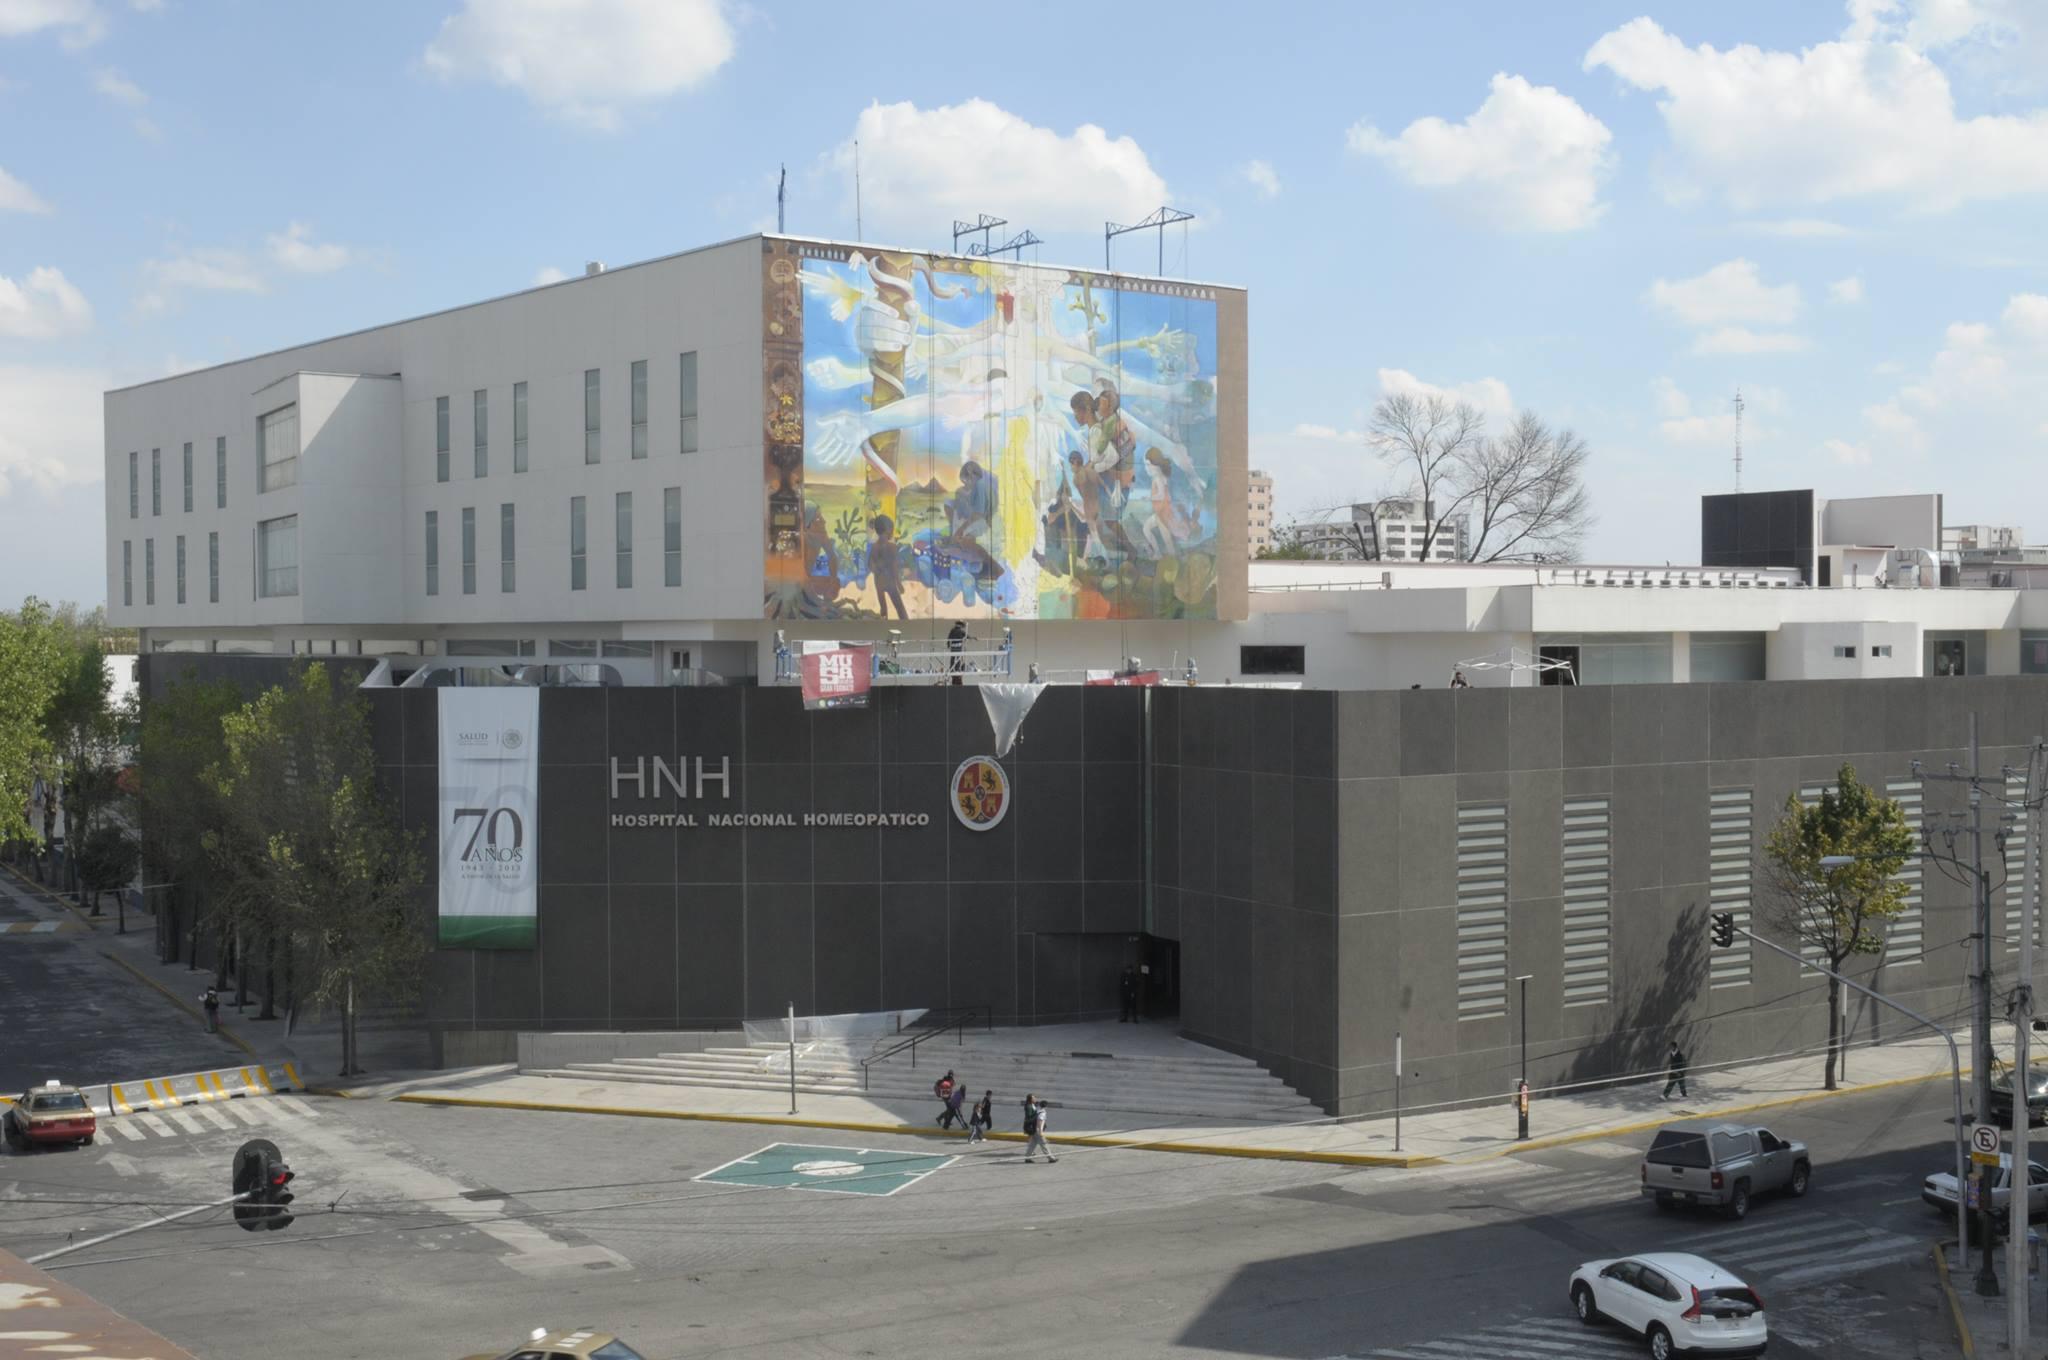 dhear-one-similia-similibus-curentur-new-mural-13